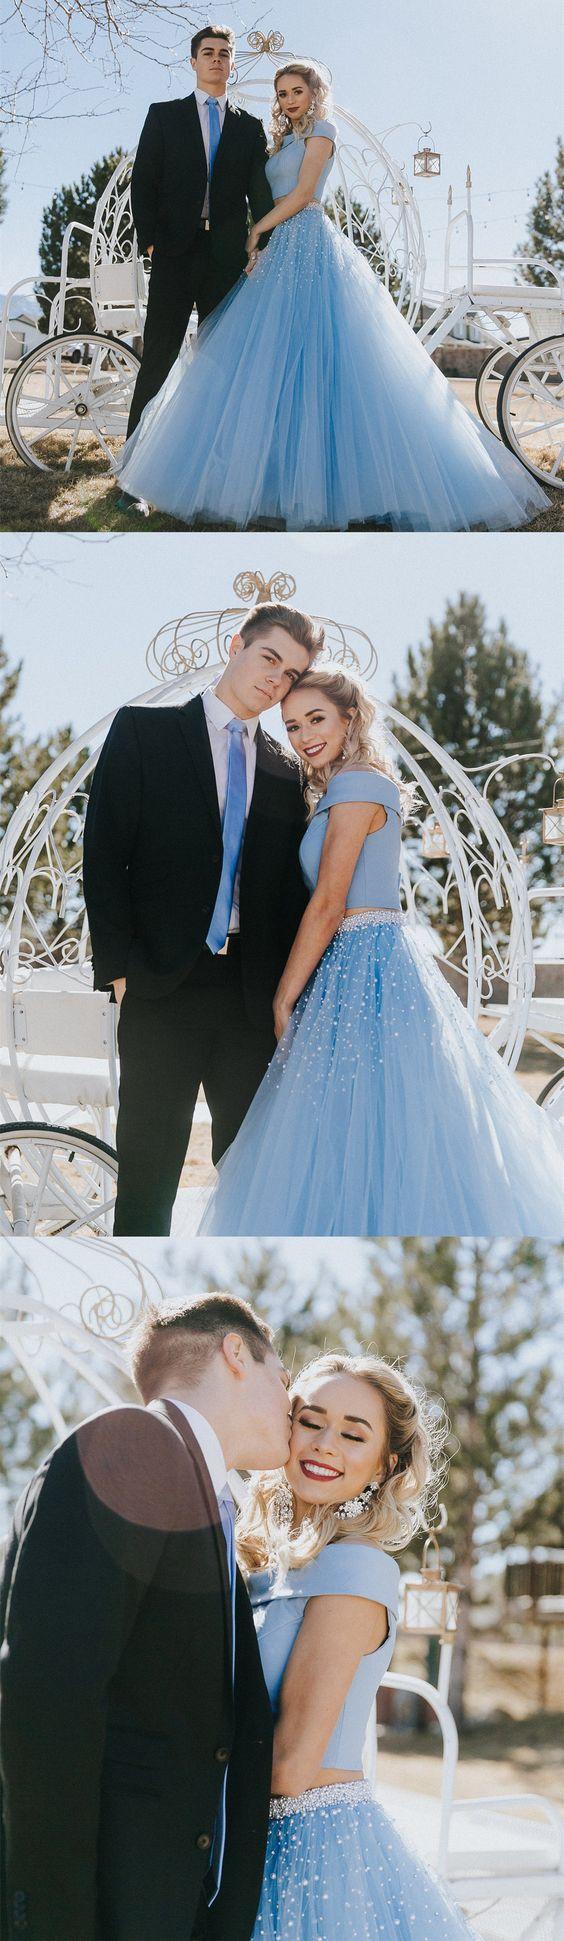 90 best ALEX PERRY BRIDAL images on Pinterest | Alex perry, Brides ...